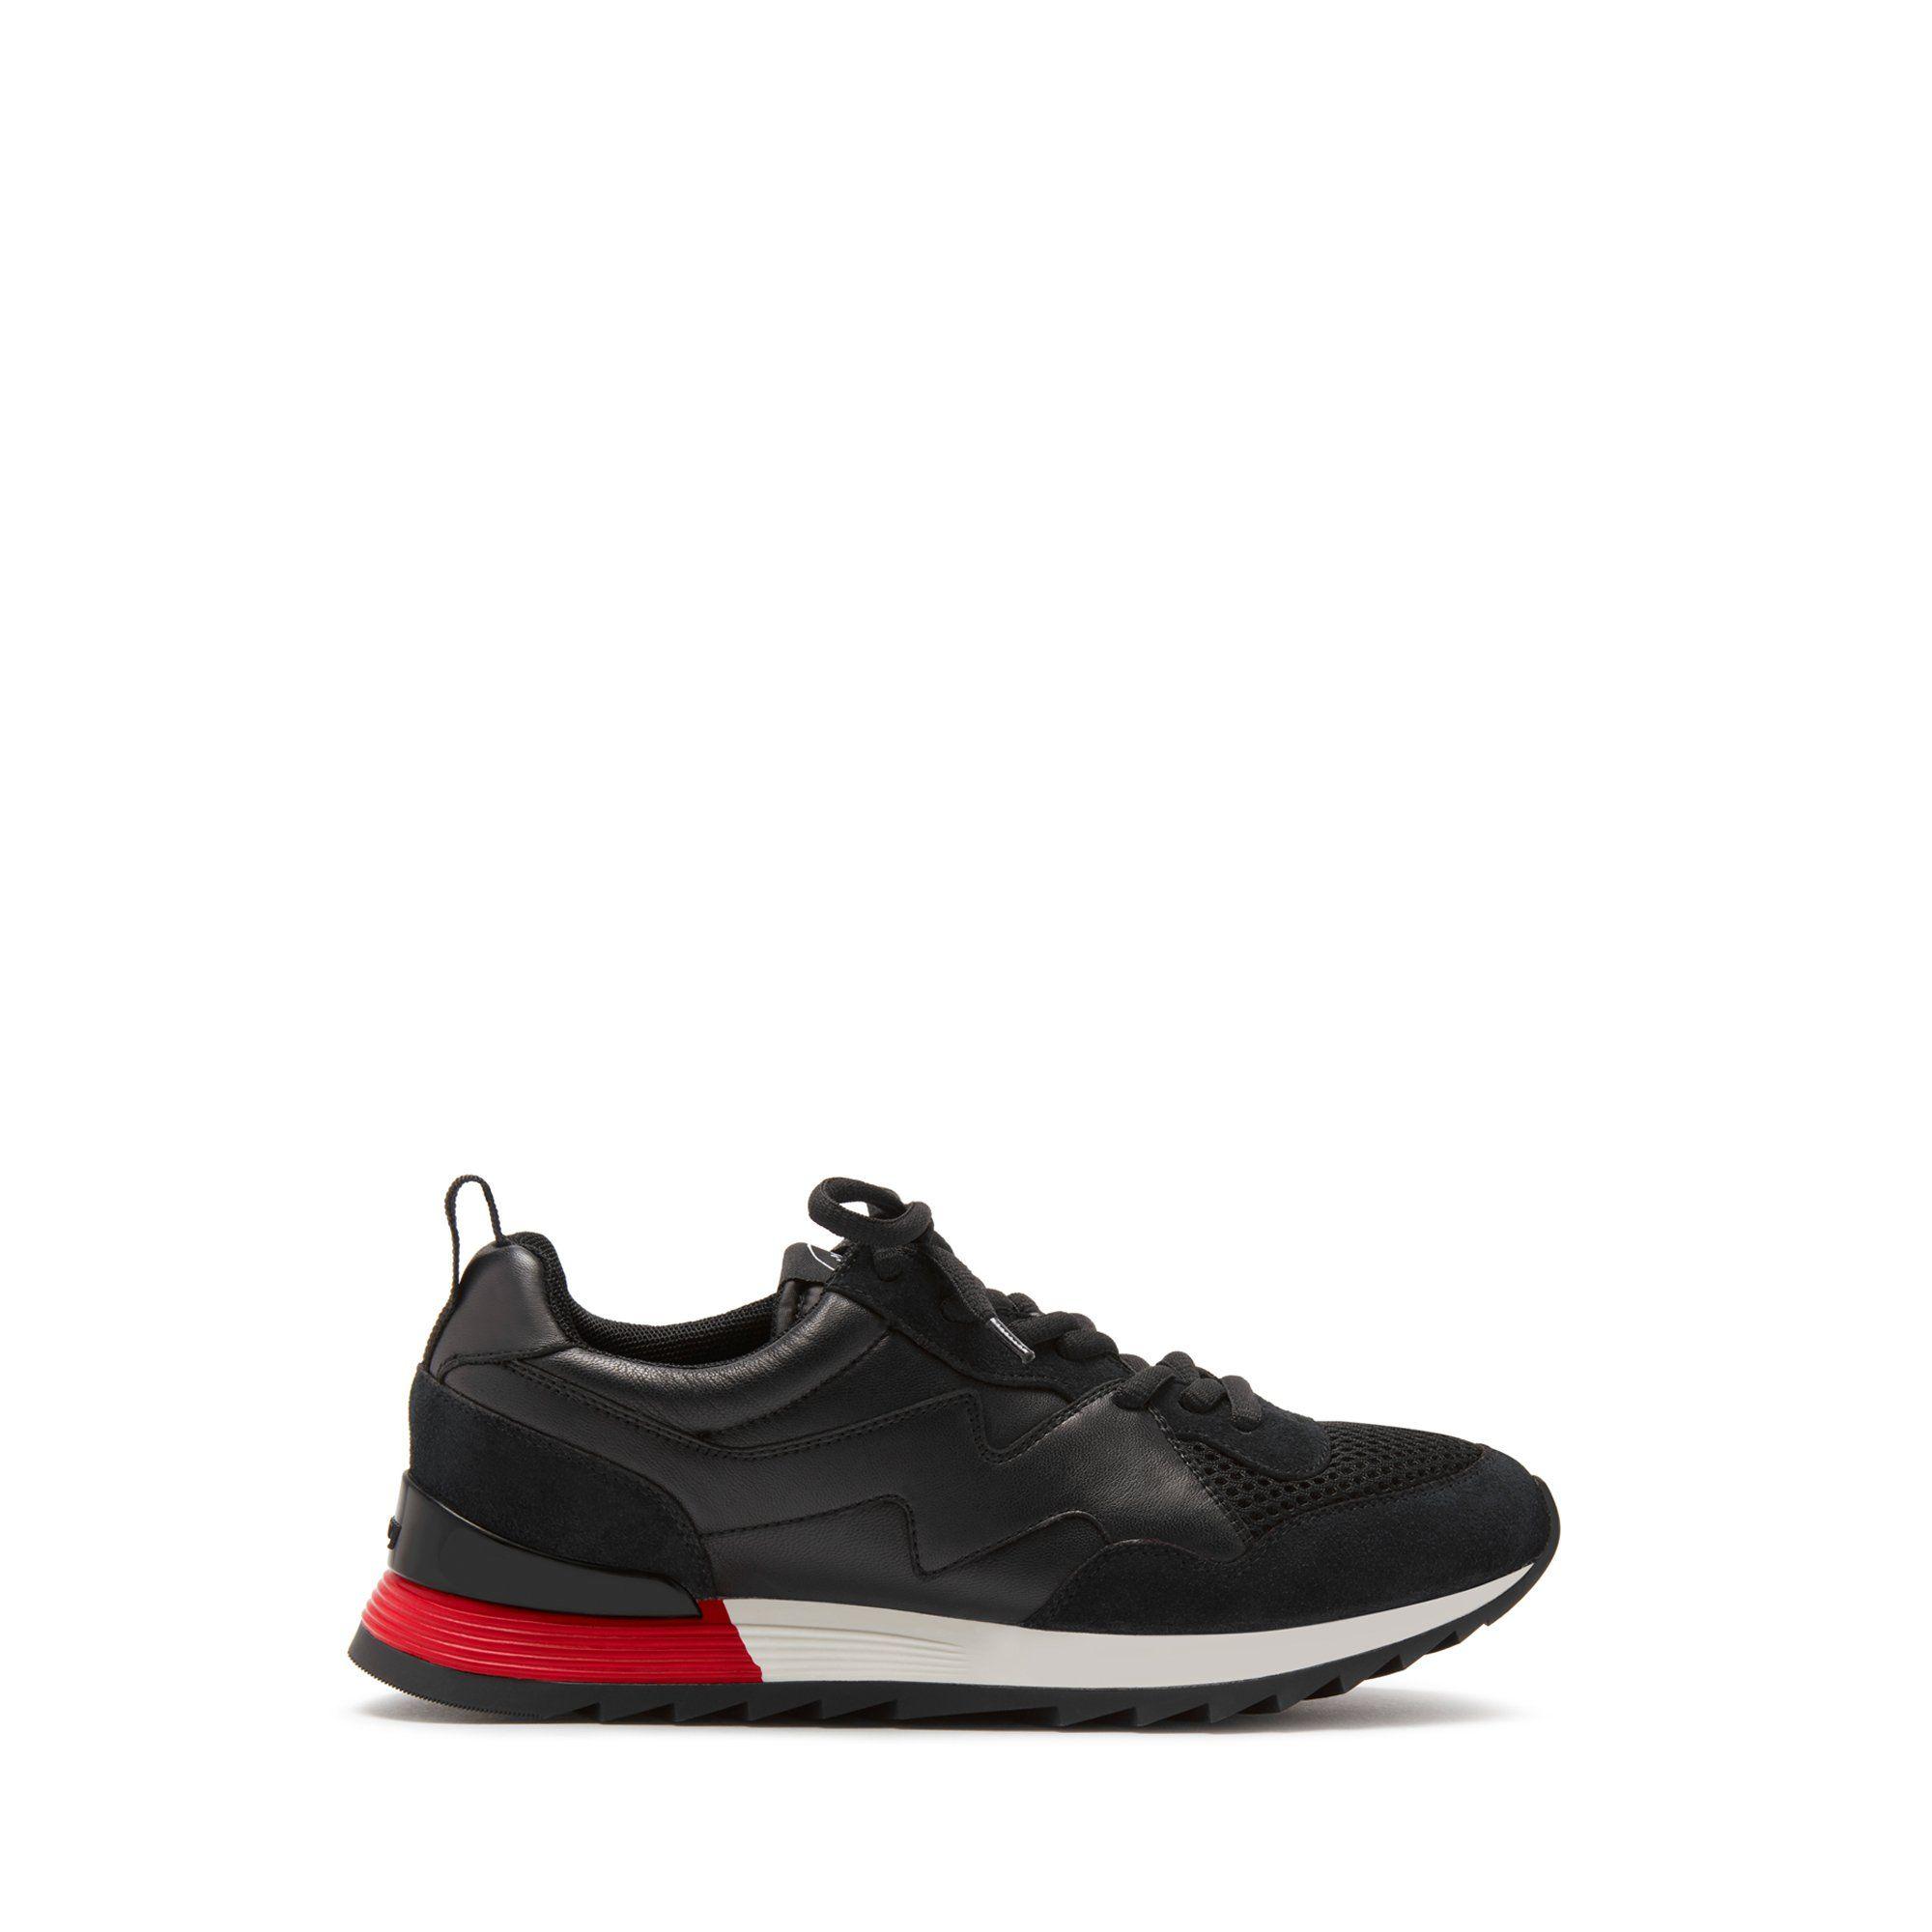 9e323adf8 Shoes | Women | Mulberry